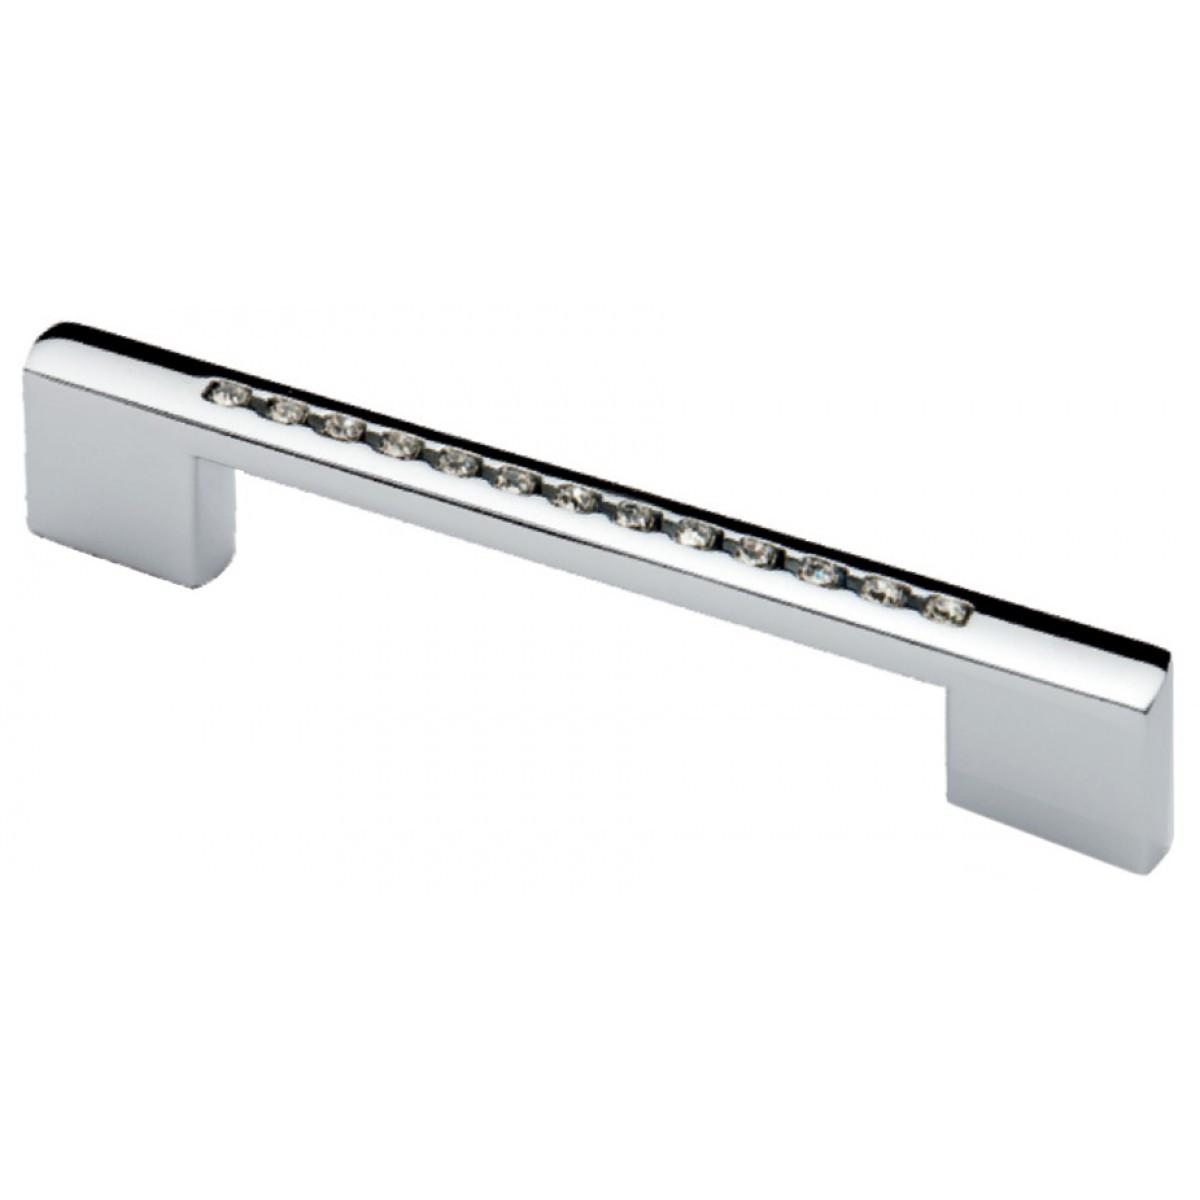 Ручка меблева Ozkardesler BERGAMA 5217-06 96-128мм з камінням Хром